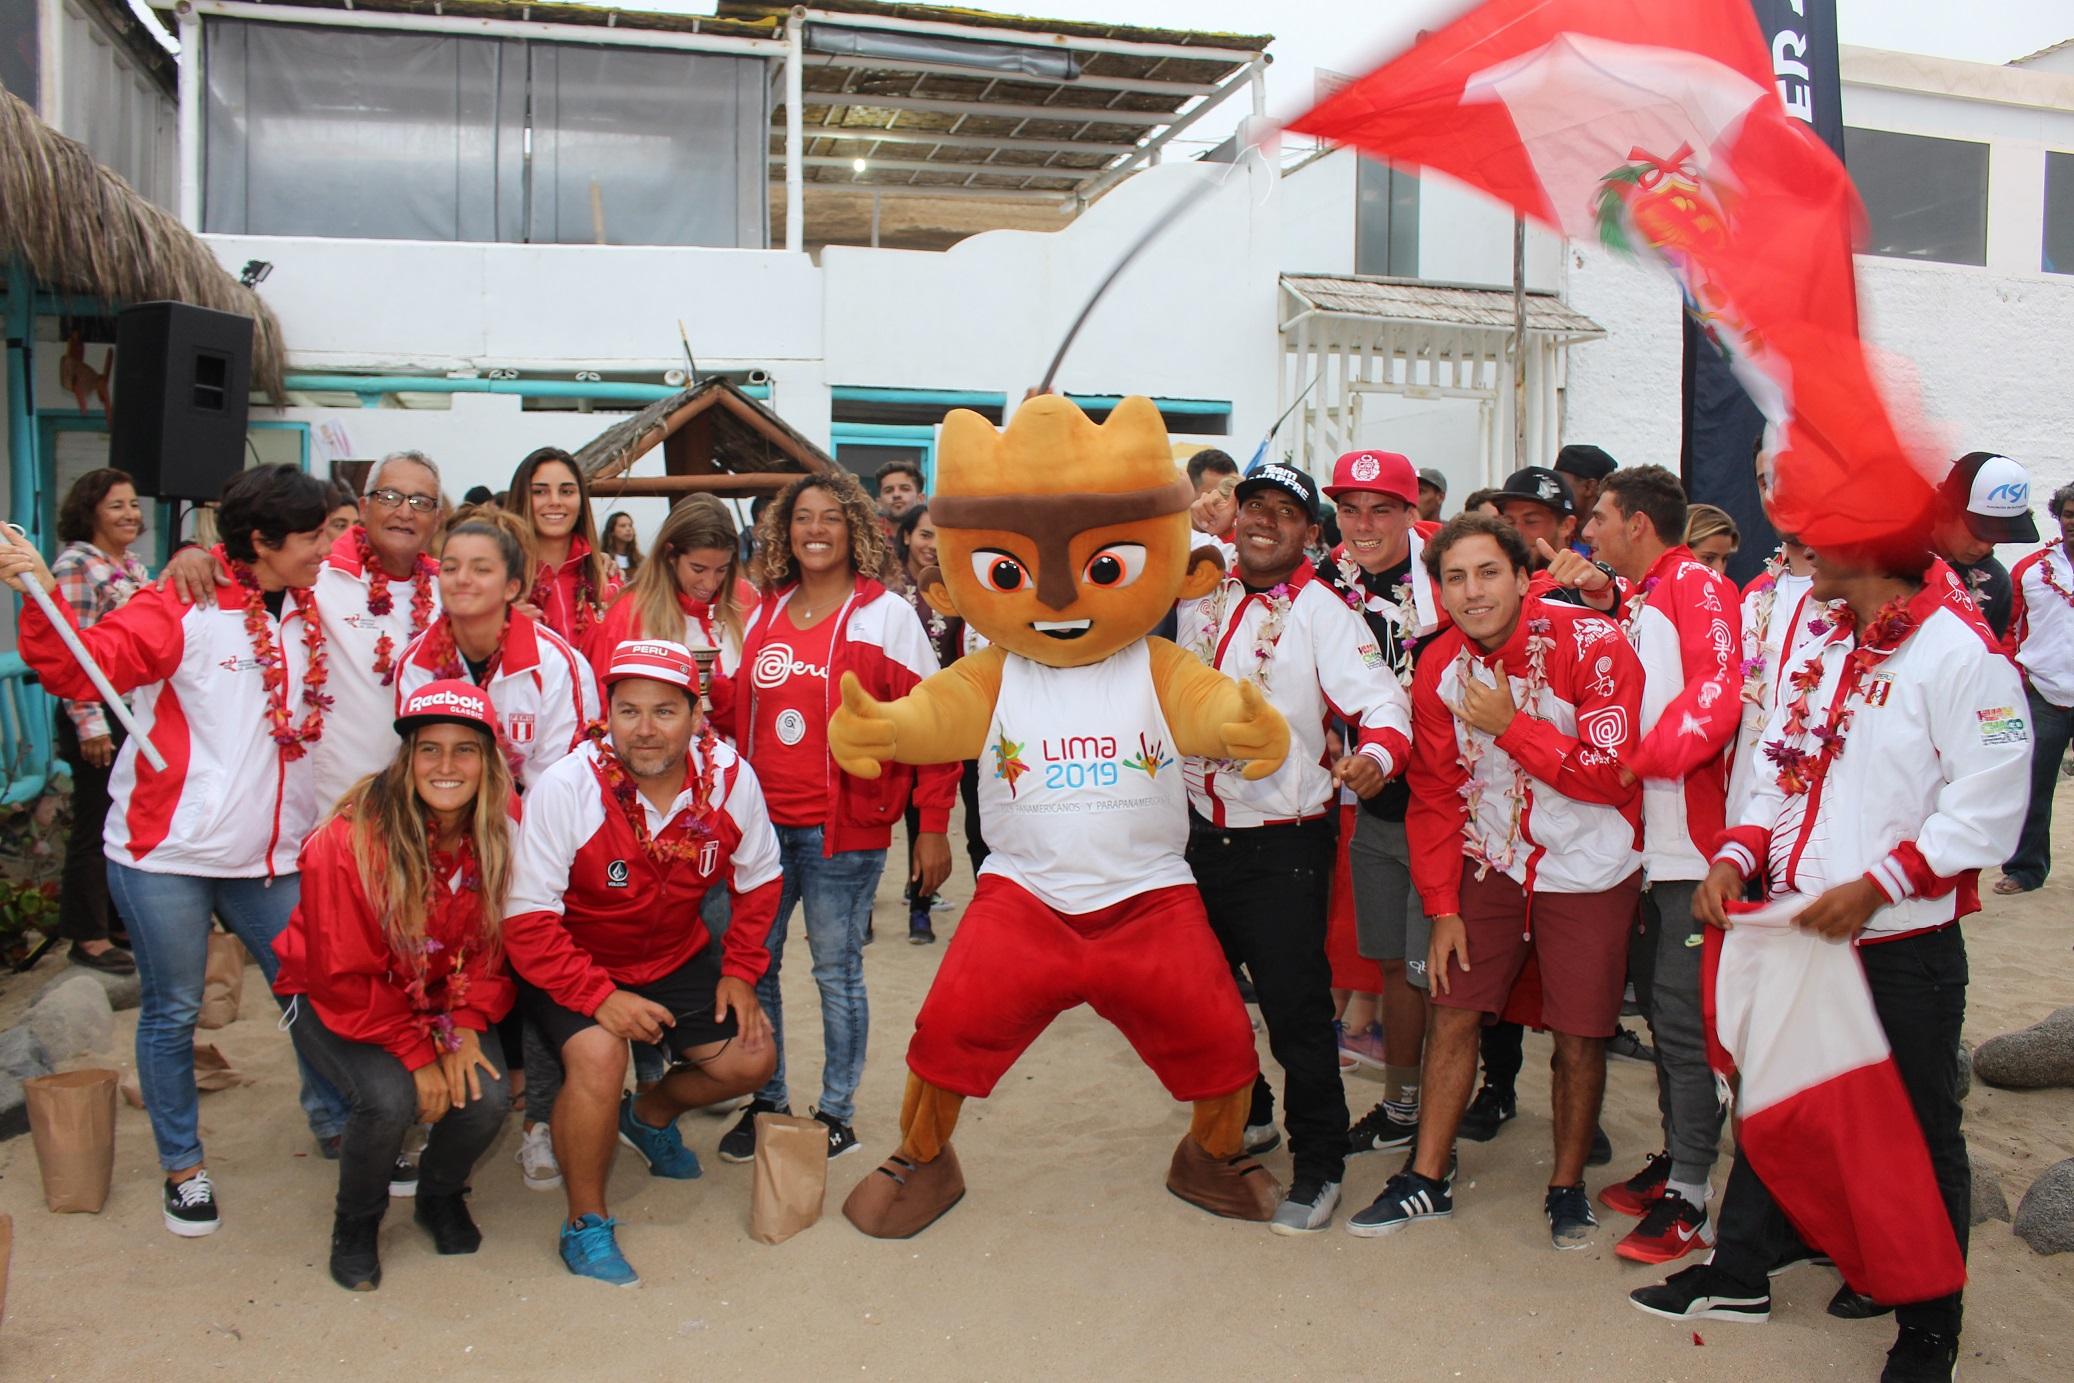 IPD incrementa ayuda económica a deportistas con miras a Lima 2019